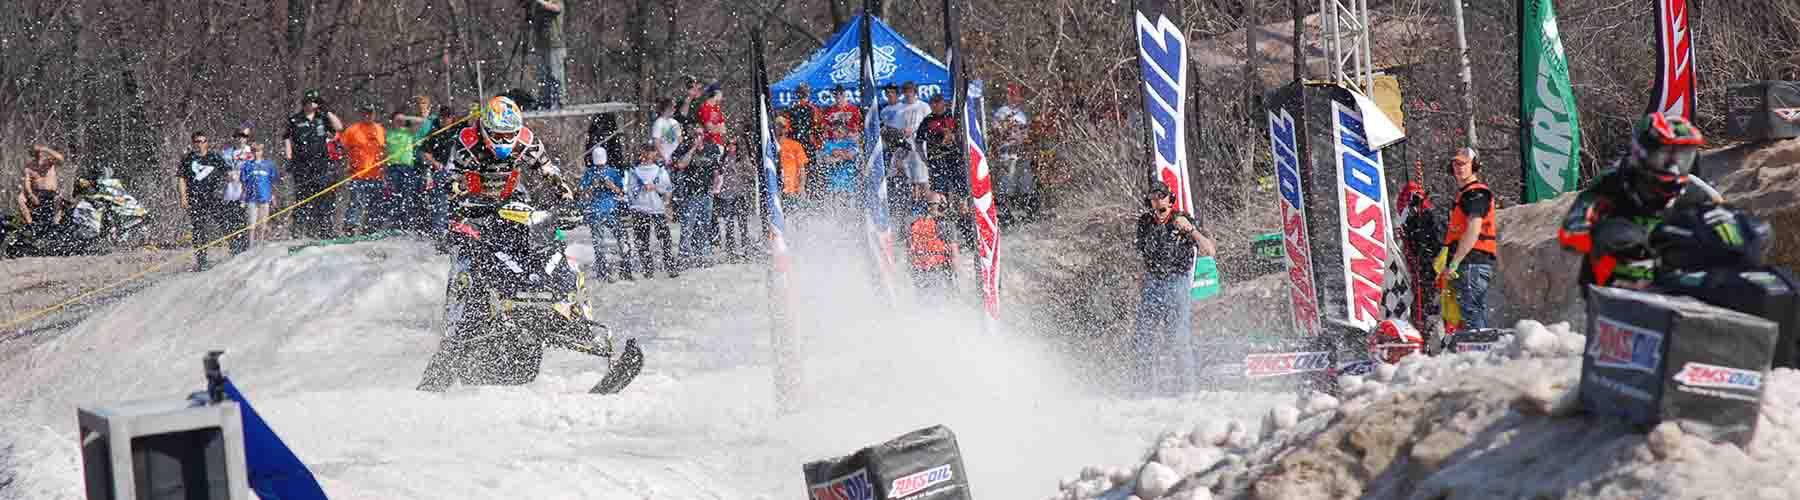 Snocross Racing